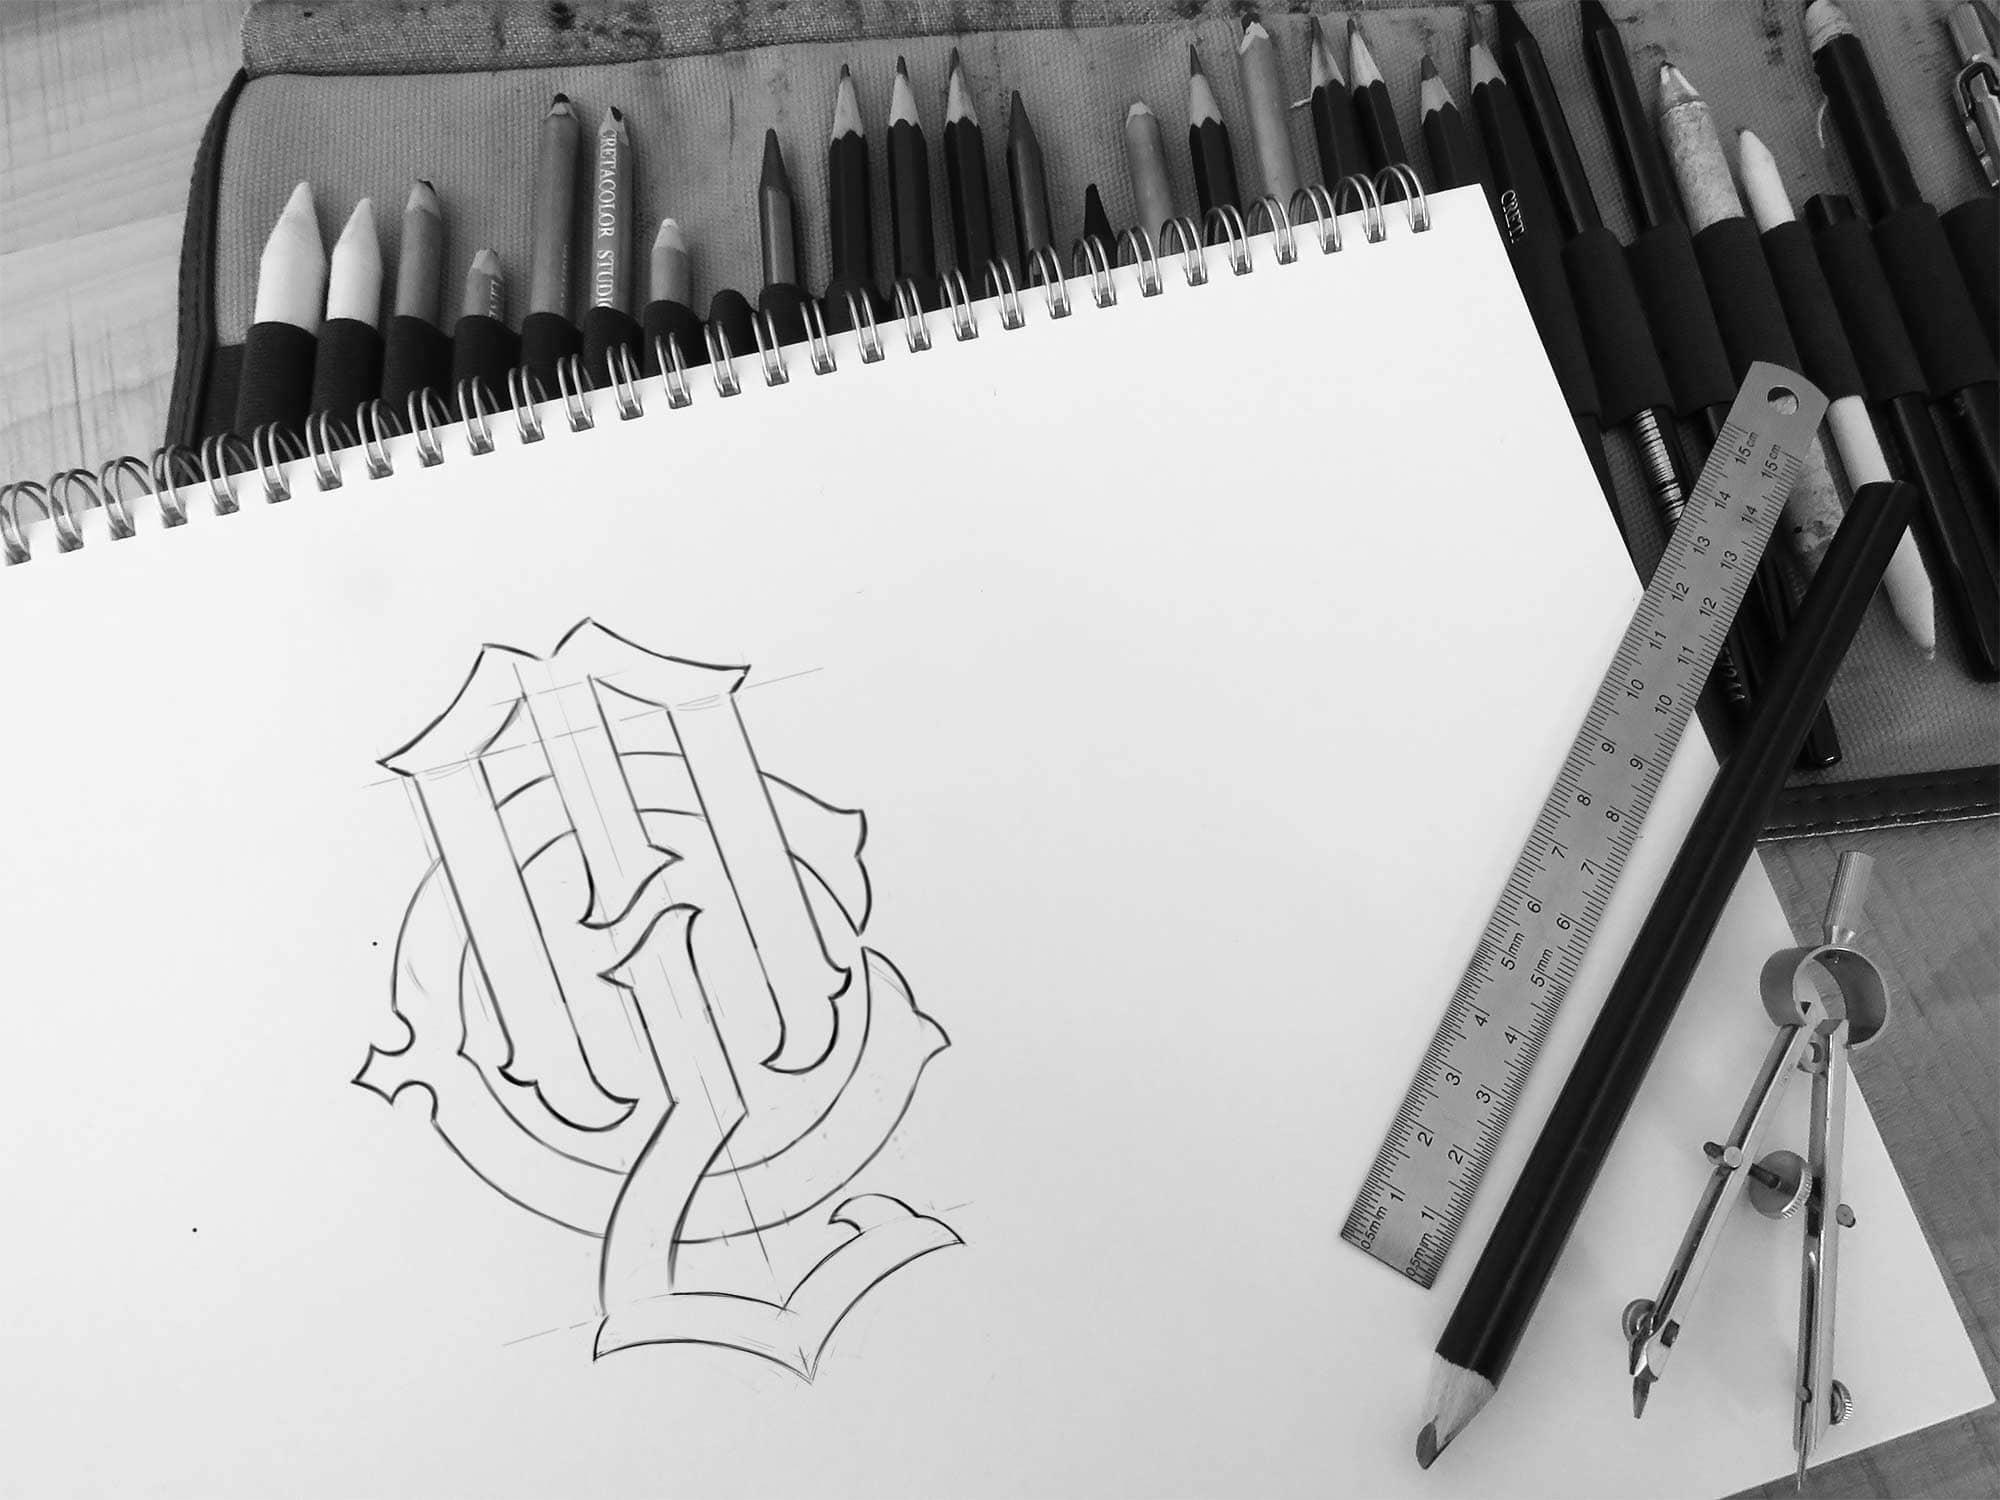 My Last Chance - Apparel Branding, Logo Sketch